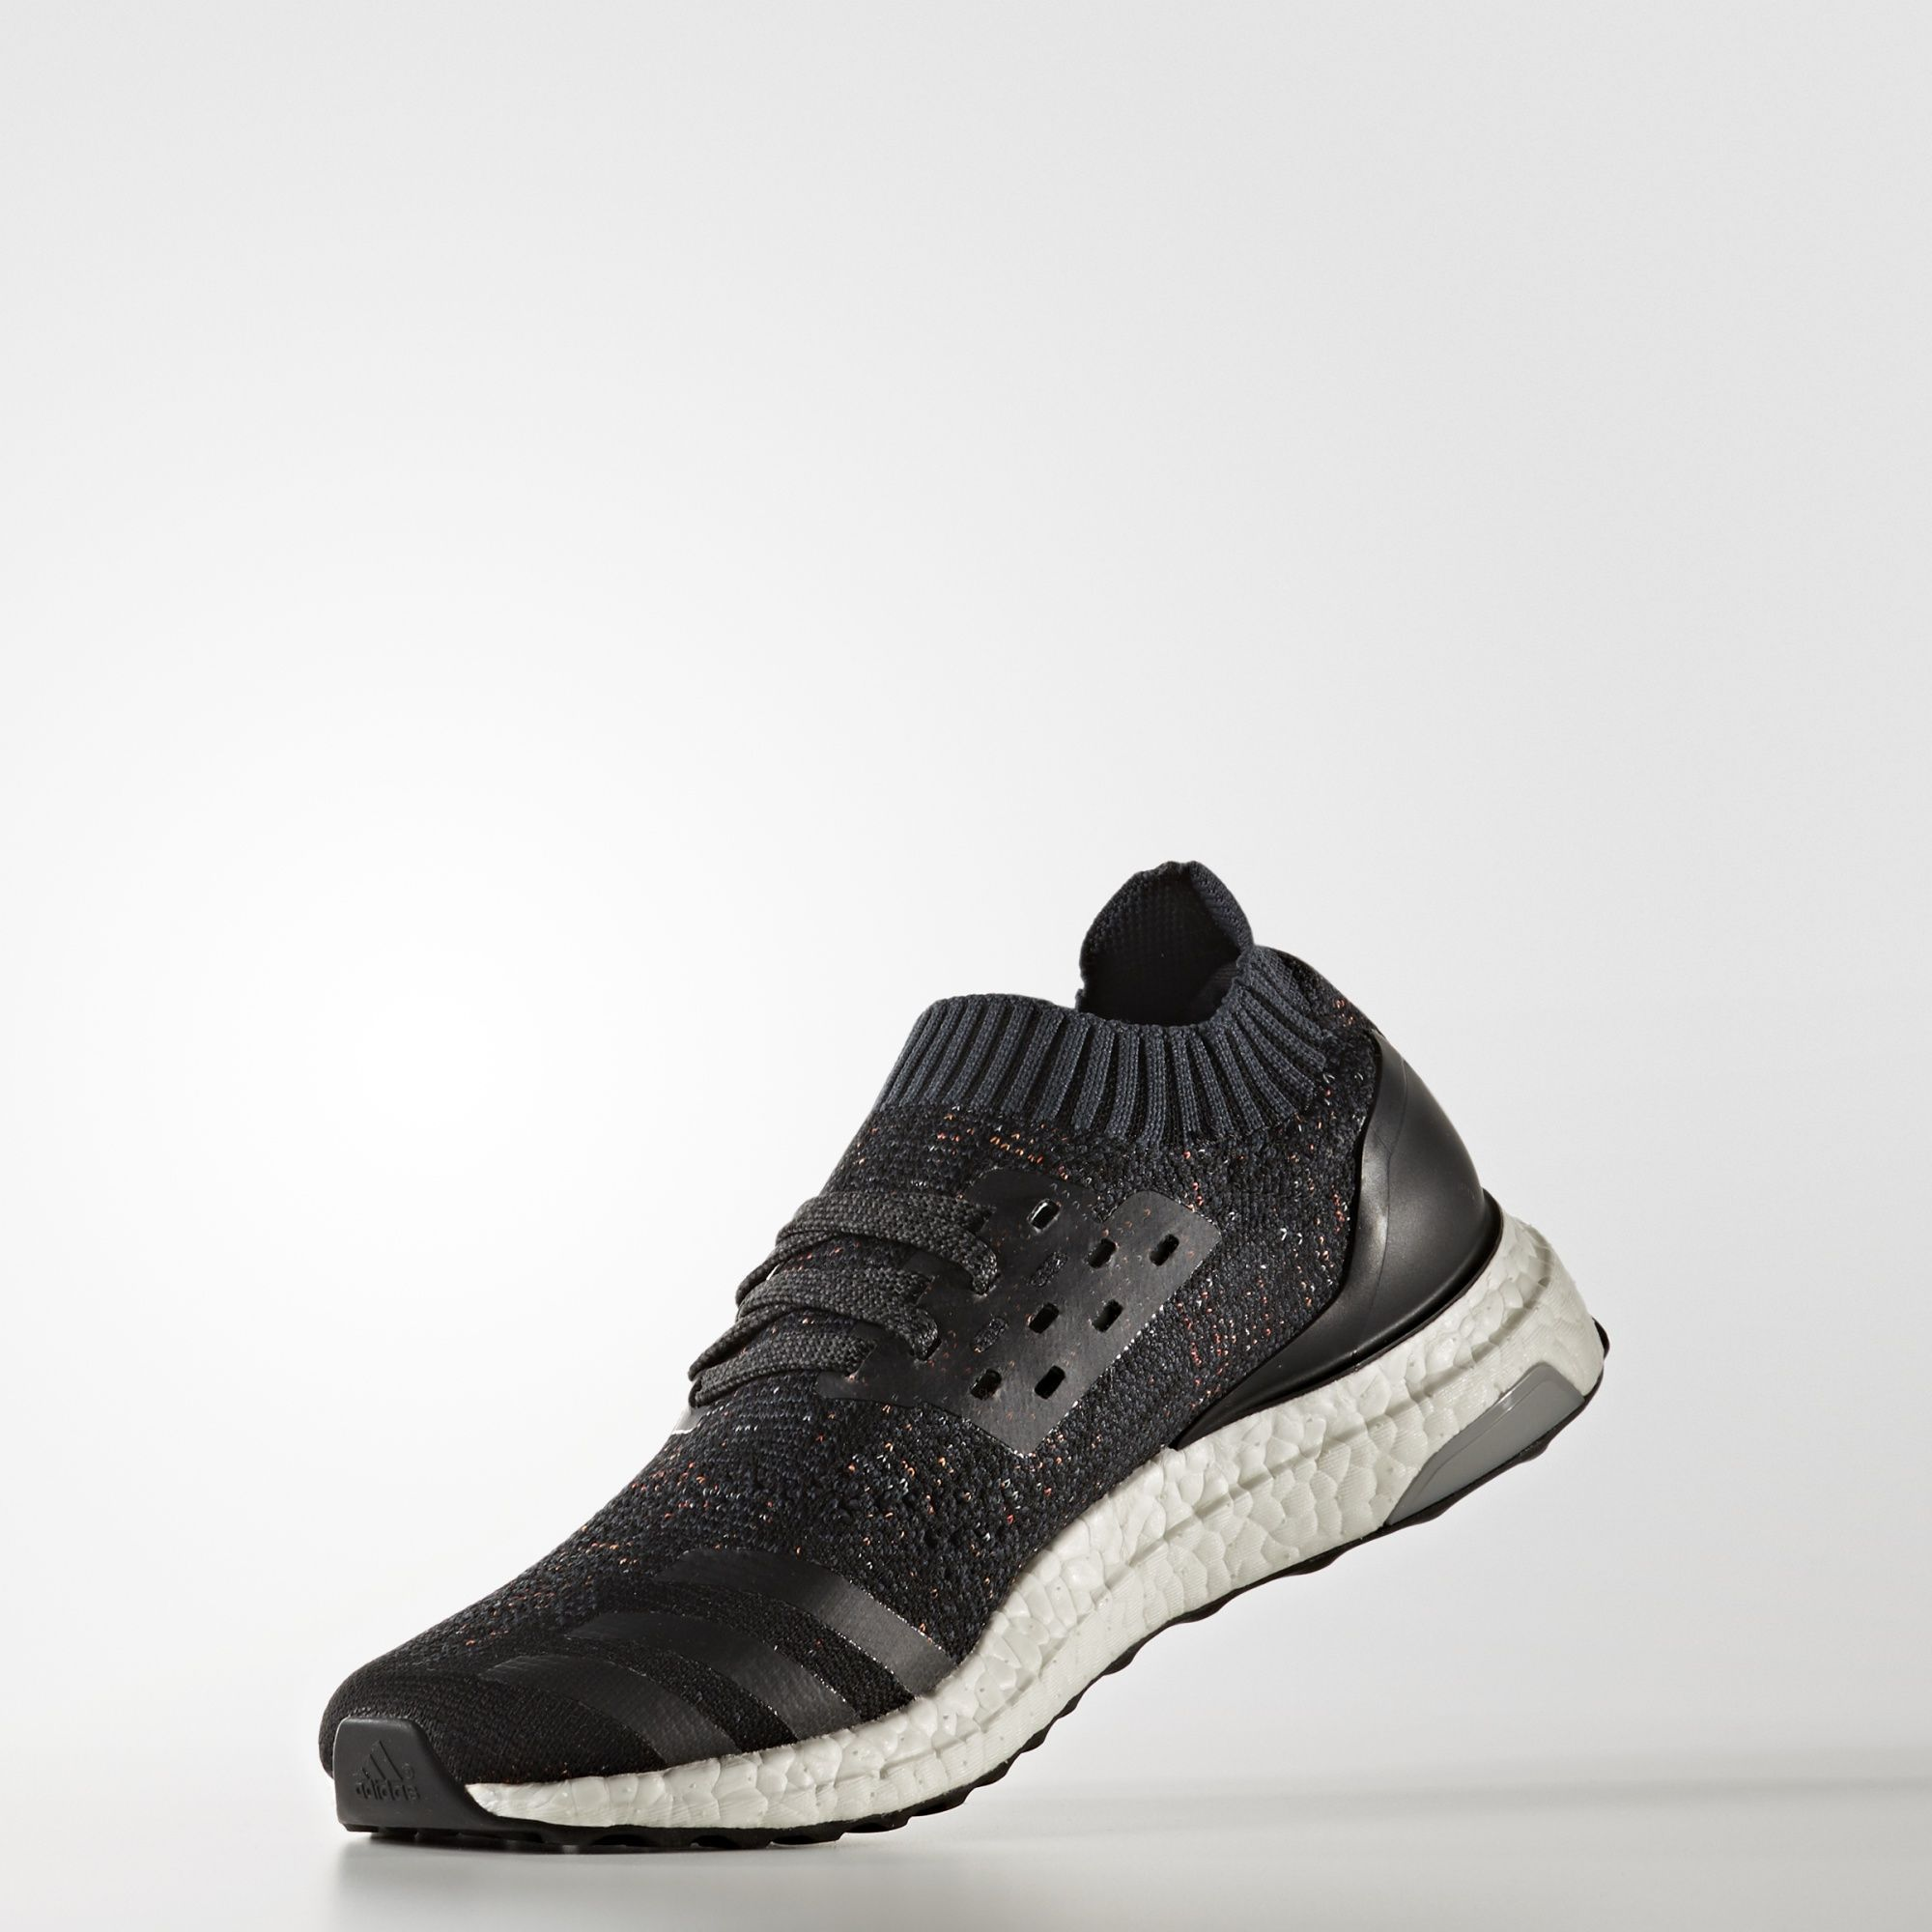 f3631ce8f315da adidas - UltraBOOST Uncaged Shoes